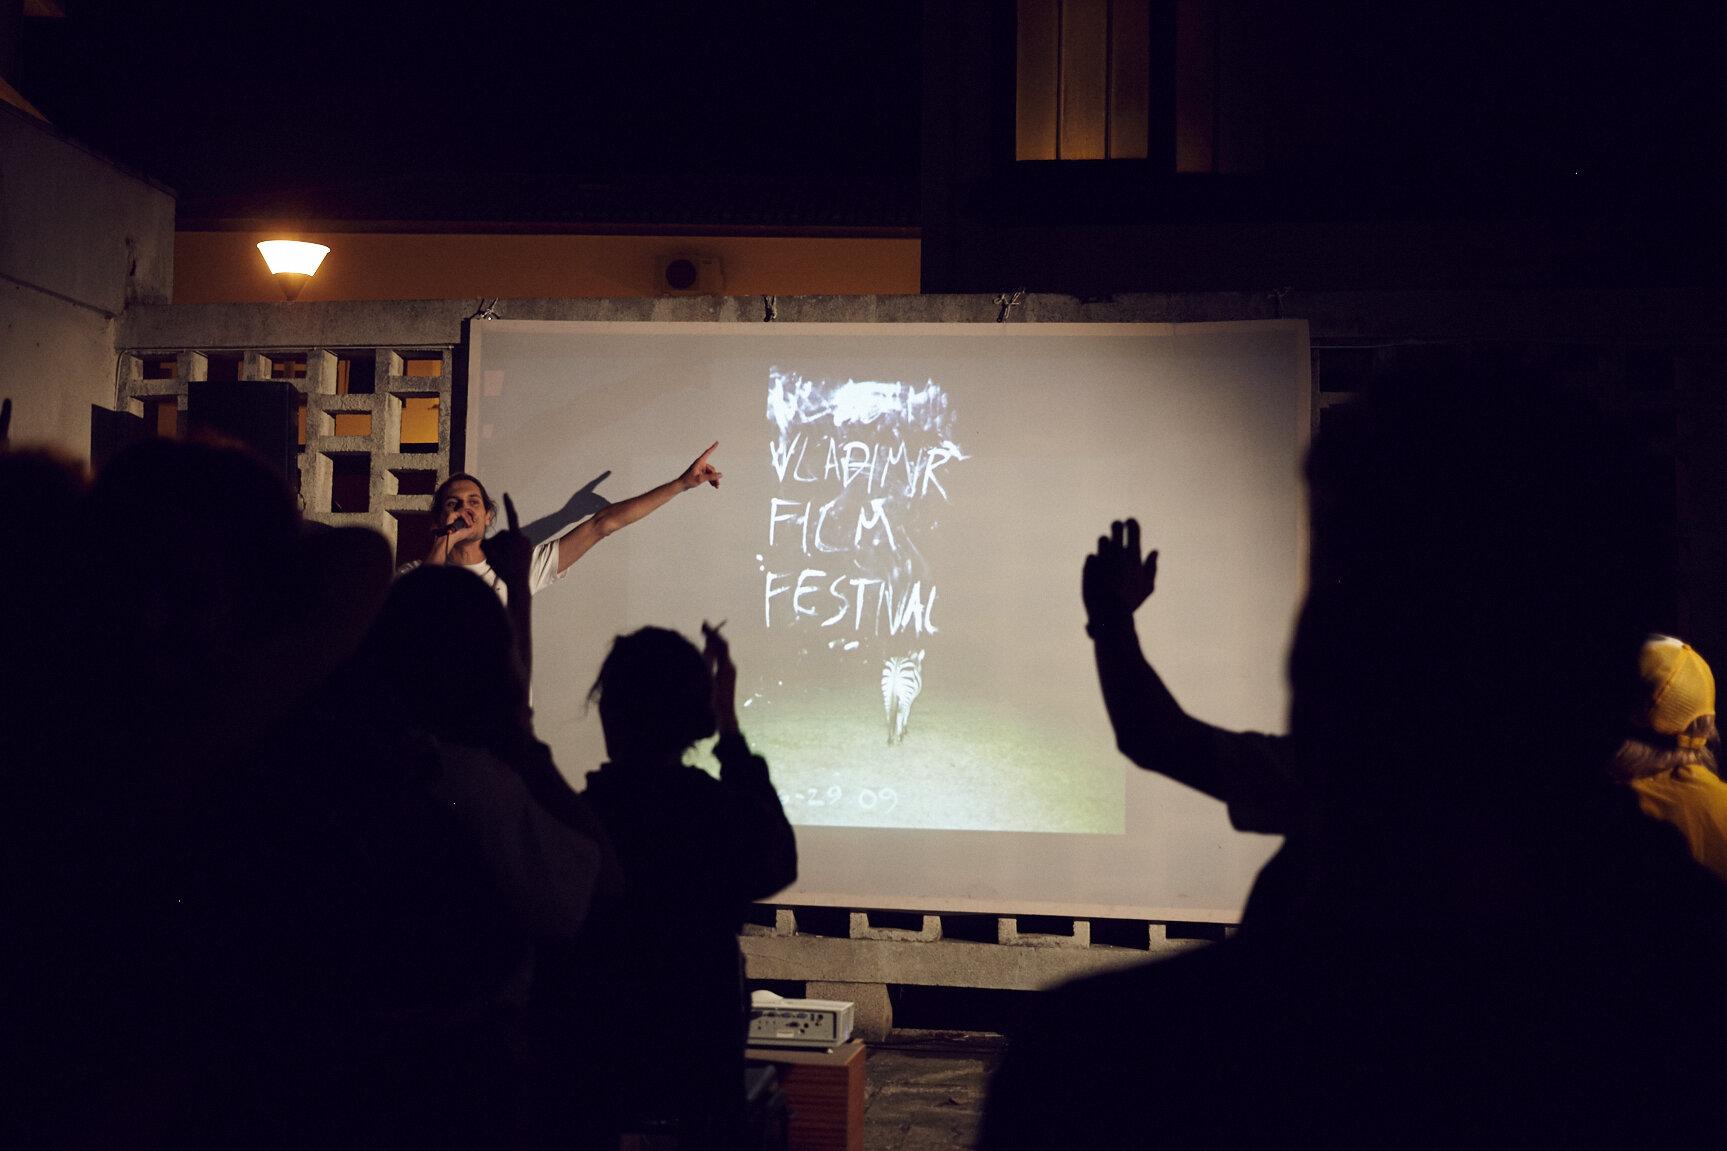 09262019_fazana_vladimir film festival_croatia_Capture_0025.jpg